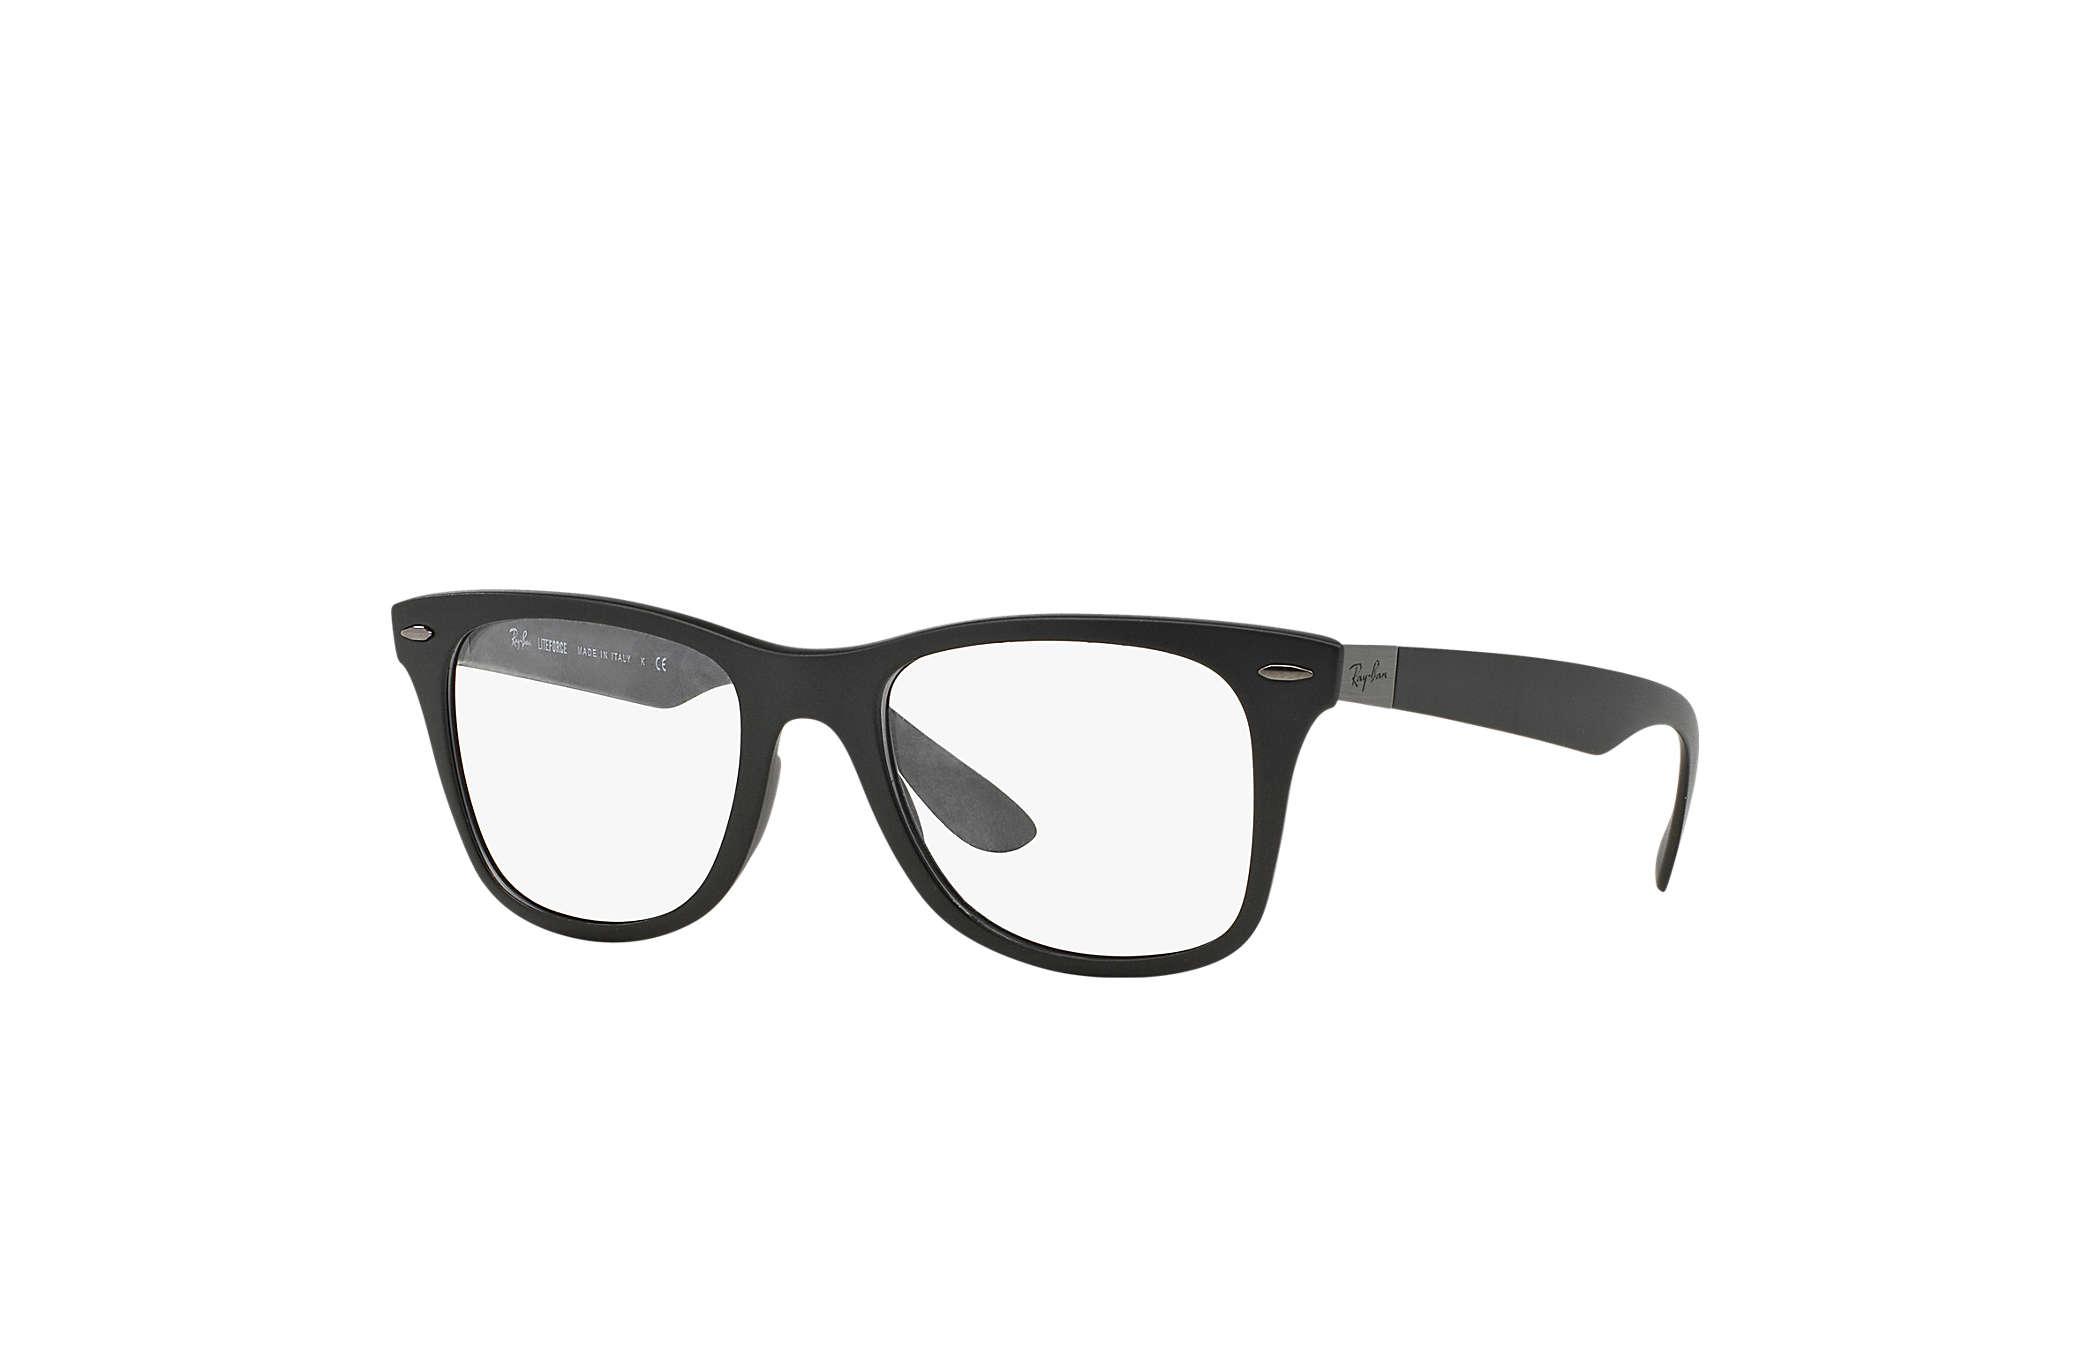 3a8cf60683e ray ban rx6275 eyeglasses  ray ban rx8724 tech eyeglasses